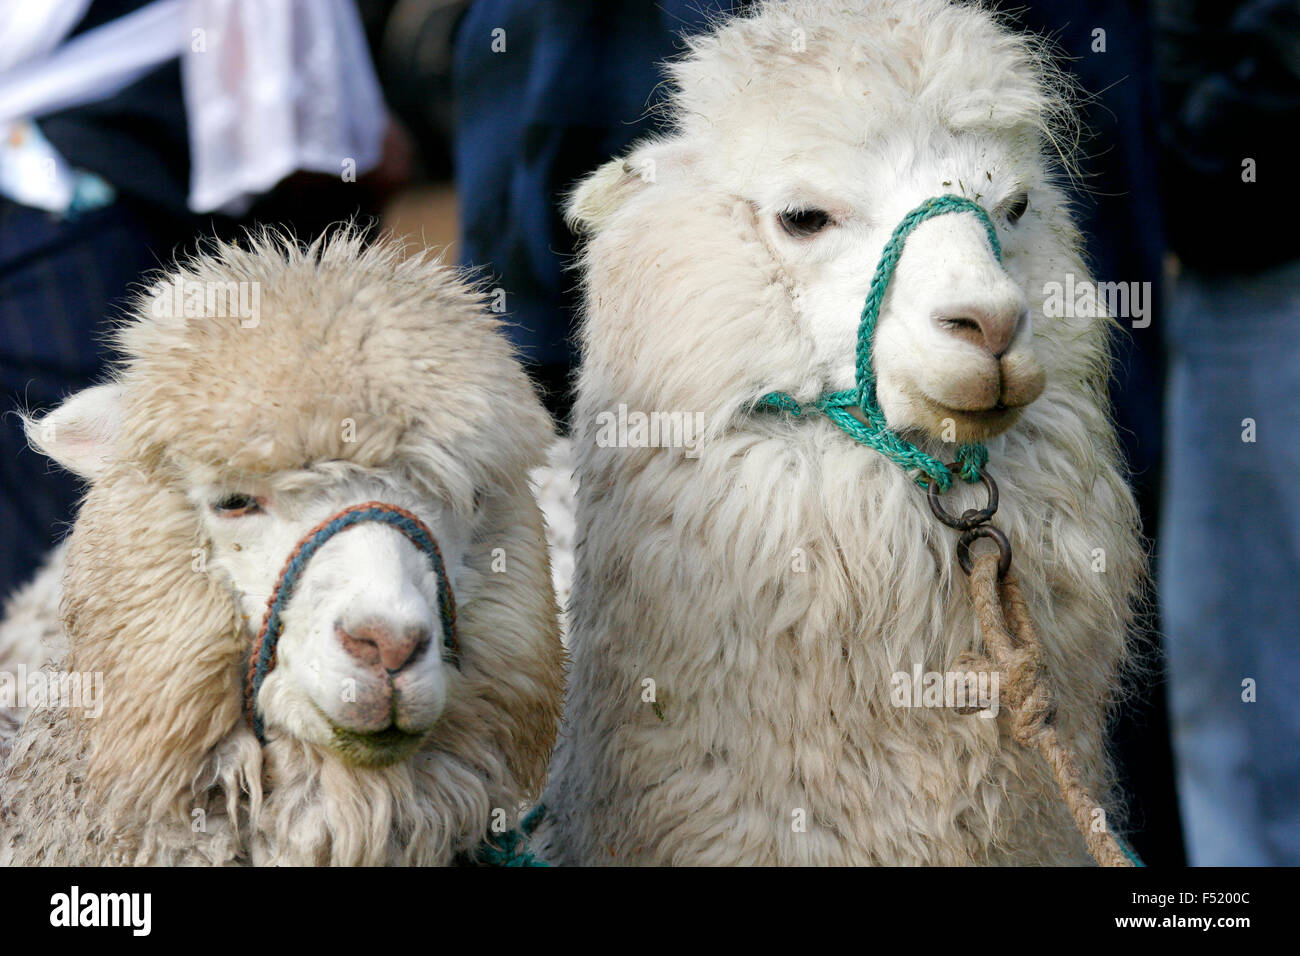 Lamas im Verkauf bei Otavalo Markt, Ecuador, Südamerika Stockbild